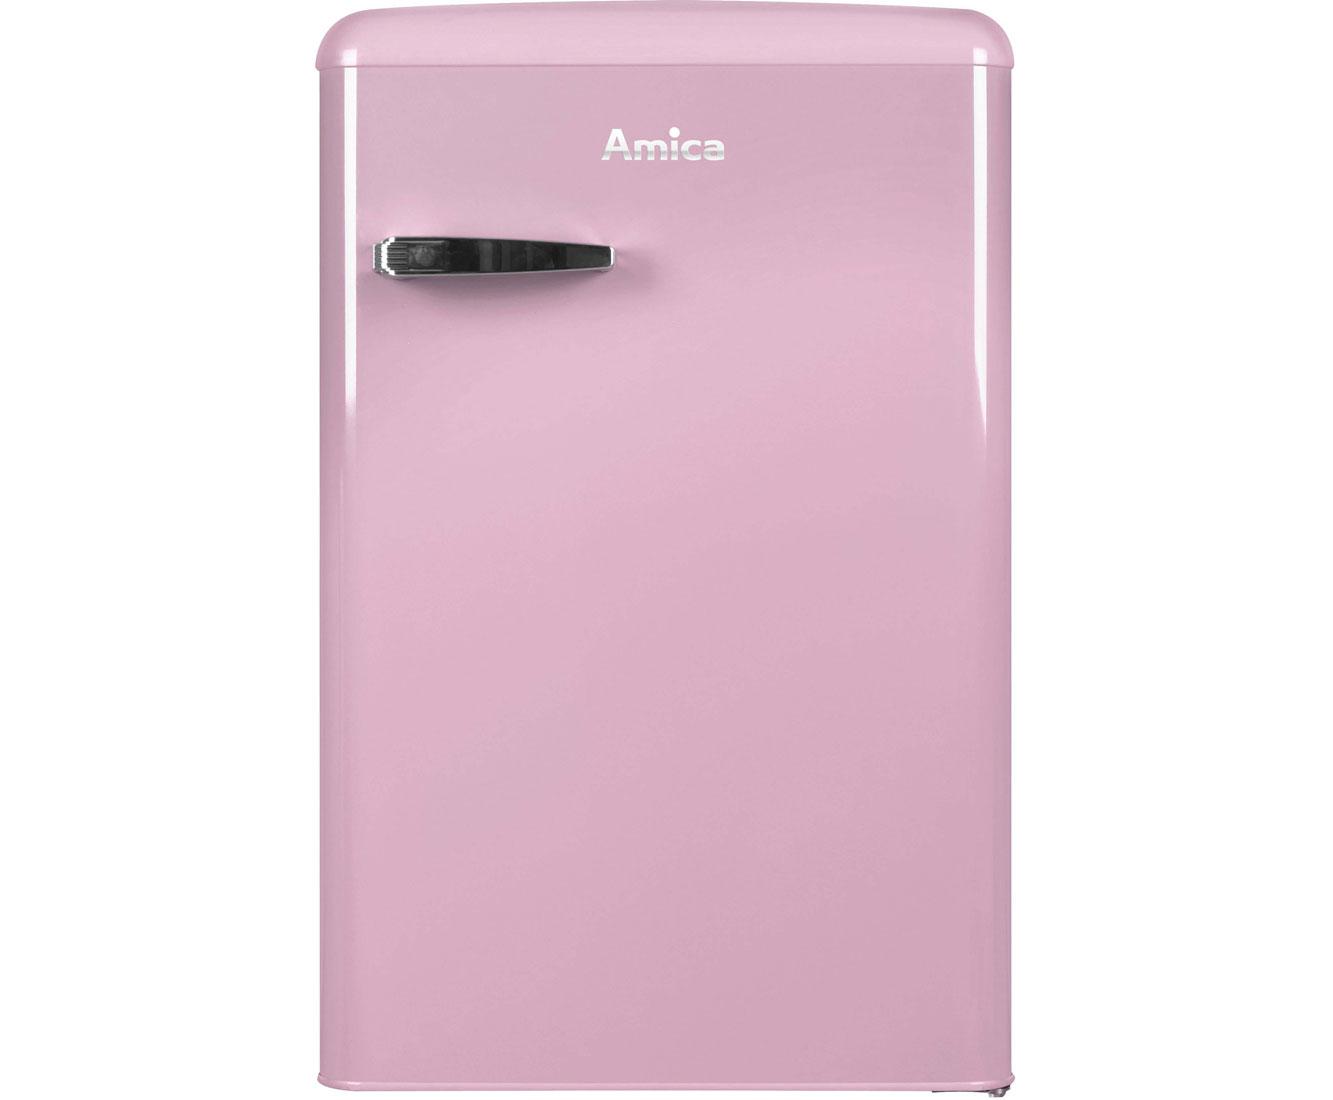 Retro Kühlschrank Notebooksbilliger : Pinker kühlschrank smeg fab28raz1 stand kühlschrank pastellblau